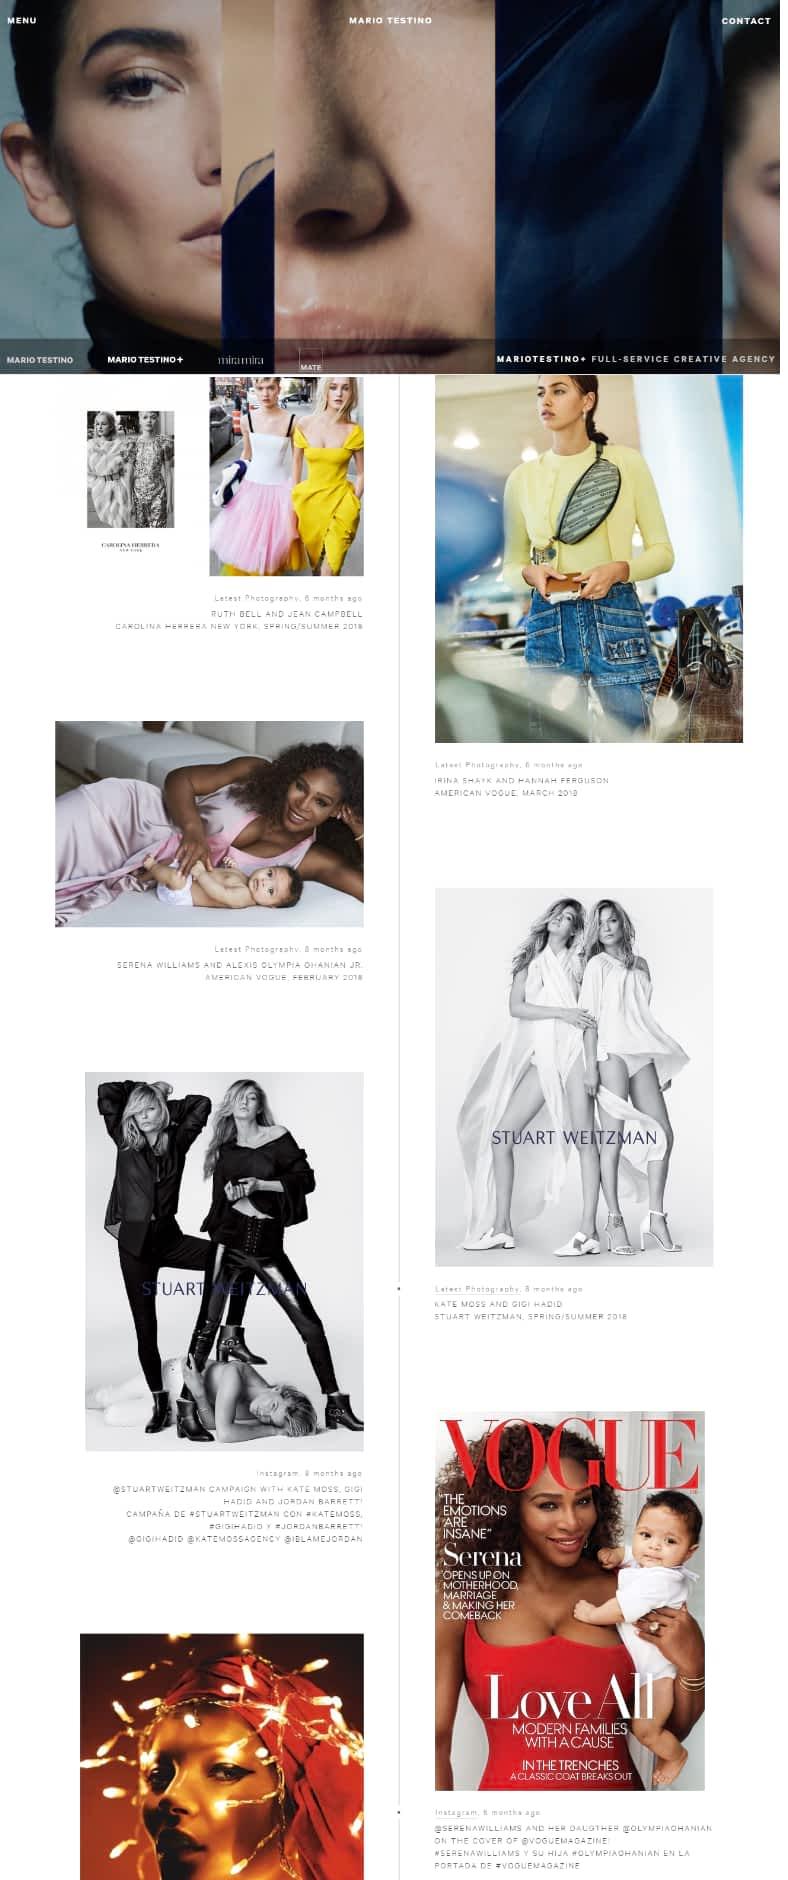 Maria Testino photography website